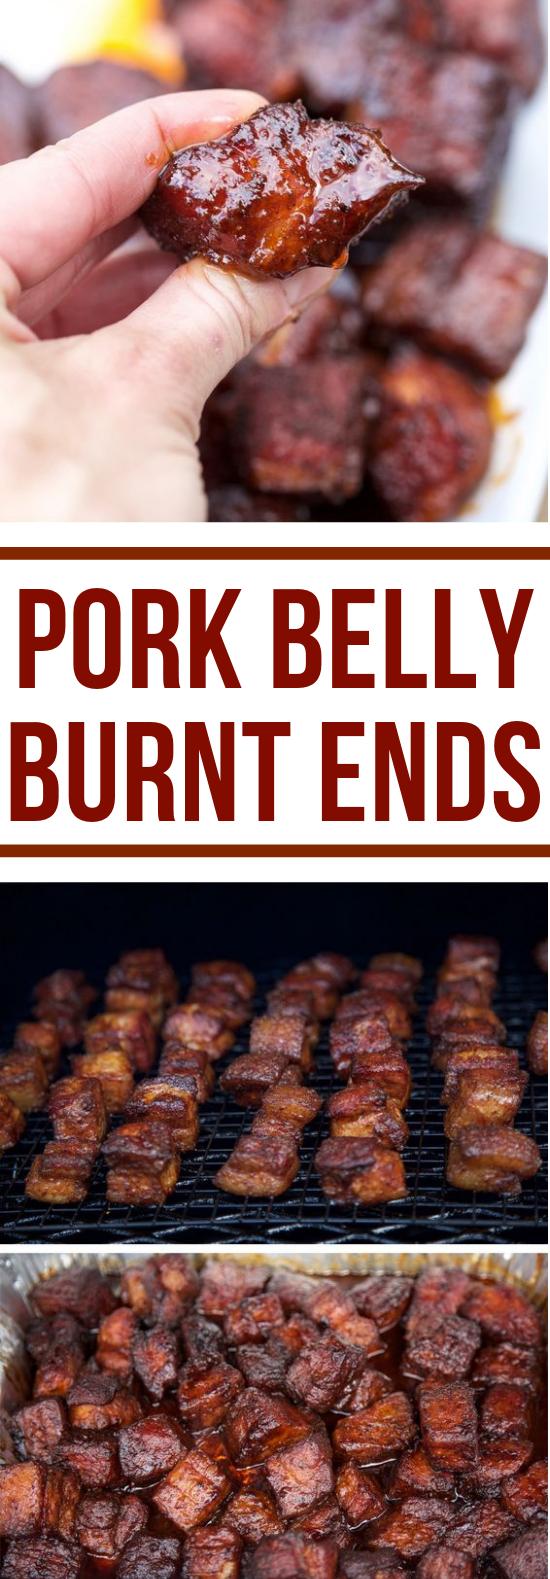 Smoked Pork Belly Burnt Ends #dinner #simpletomake